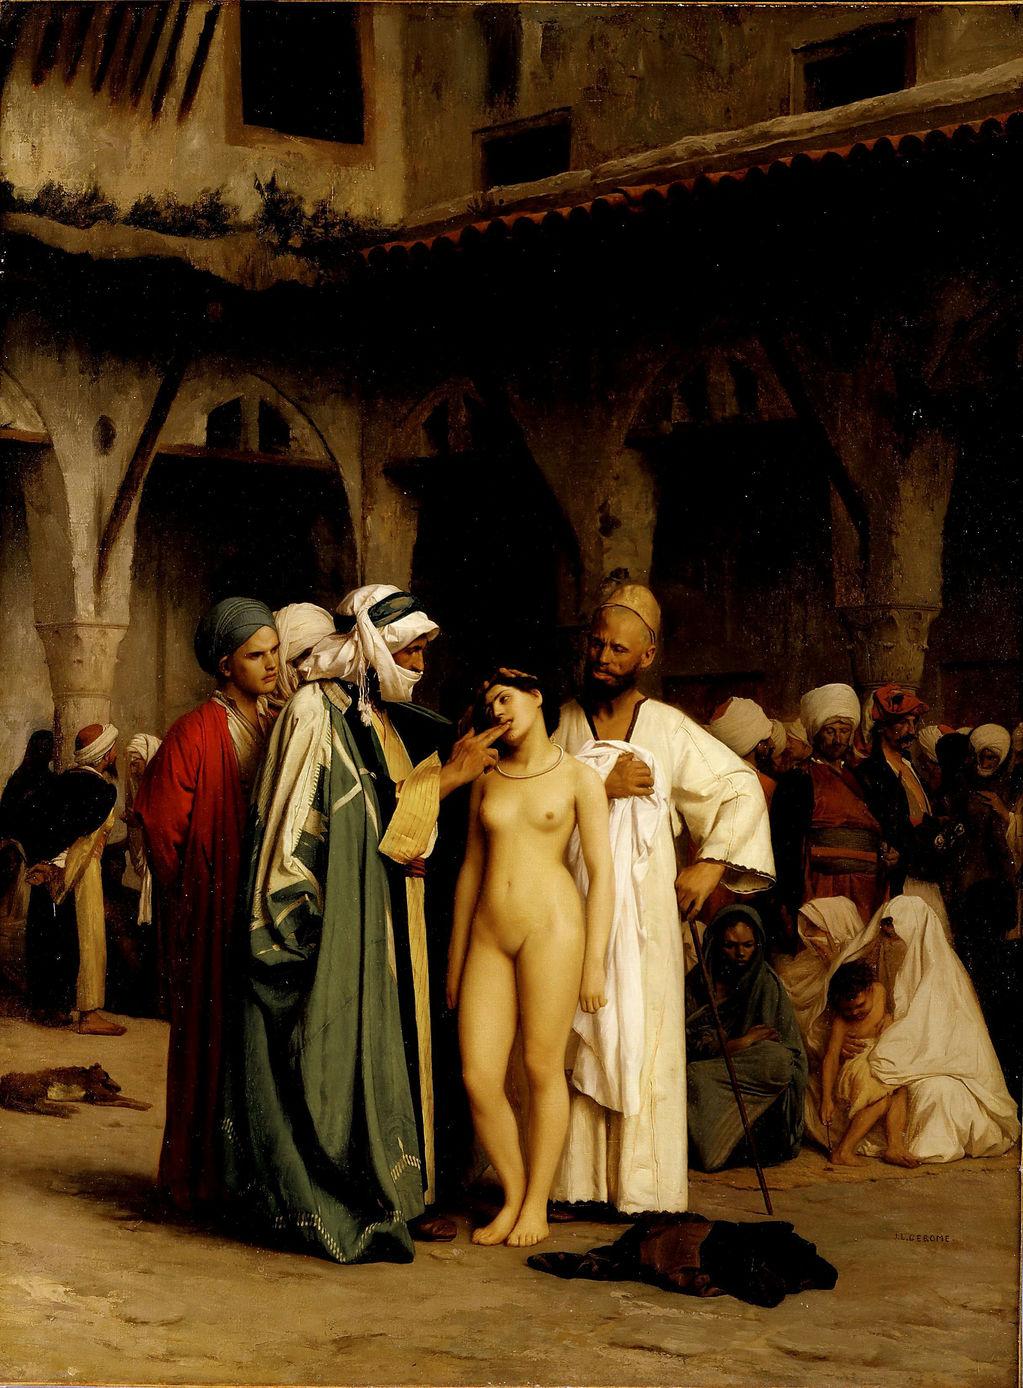 Жан -Леон Жером - ринок рабів 1870 р.